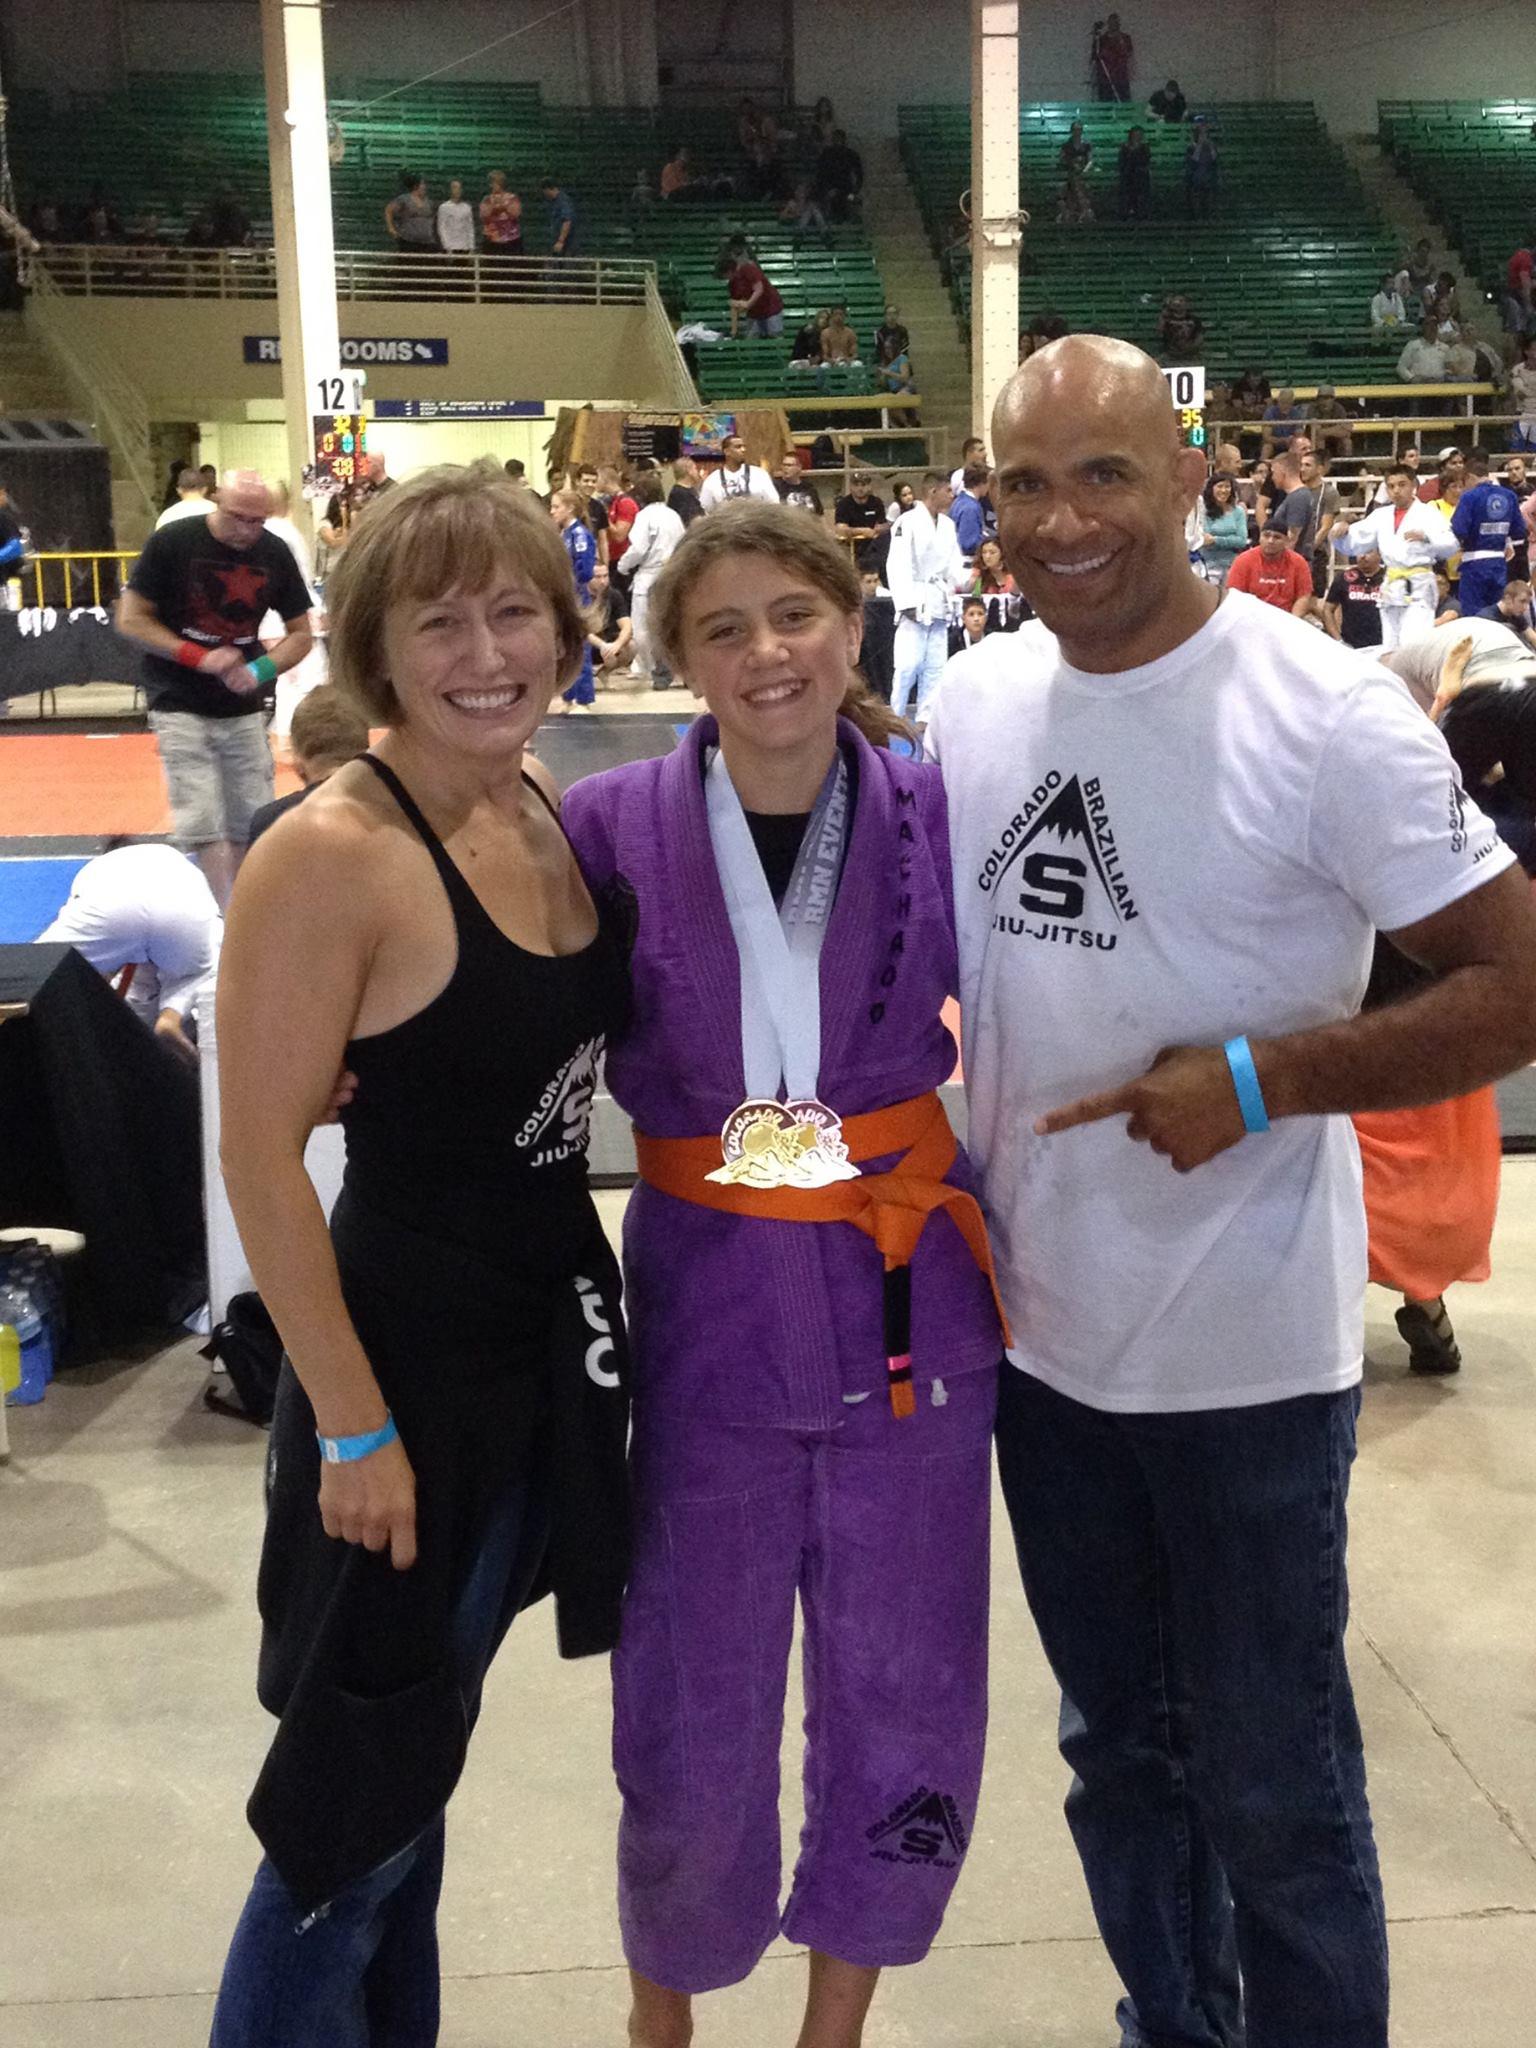 Fight To Win 2014 Colorado Open - Kate Stewart - Gold and Bronze - Teri Stewart - Professor Sean Stewart